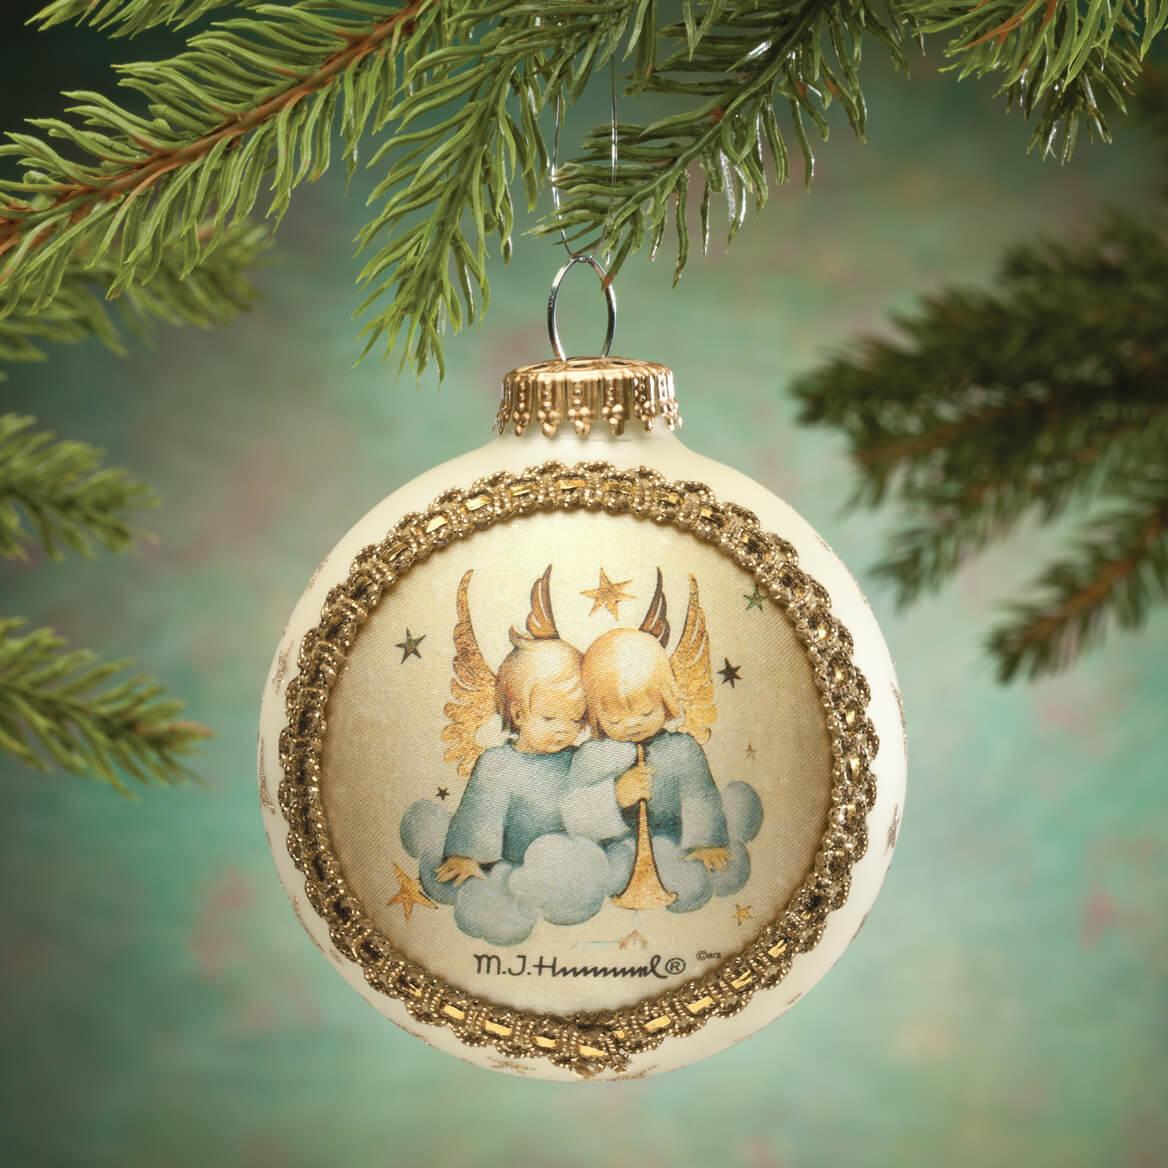 Hummel Christmas Ornament